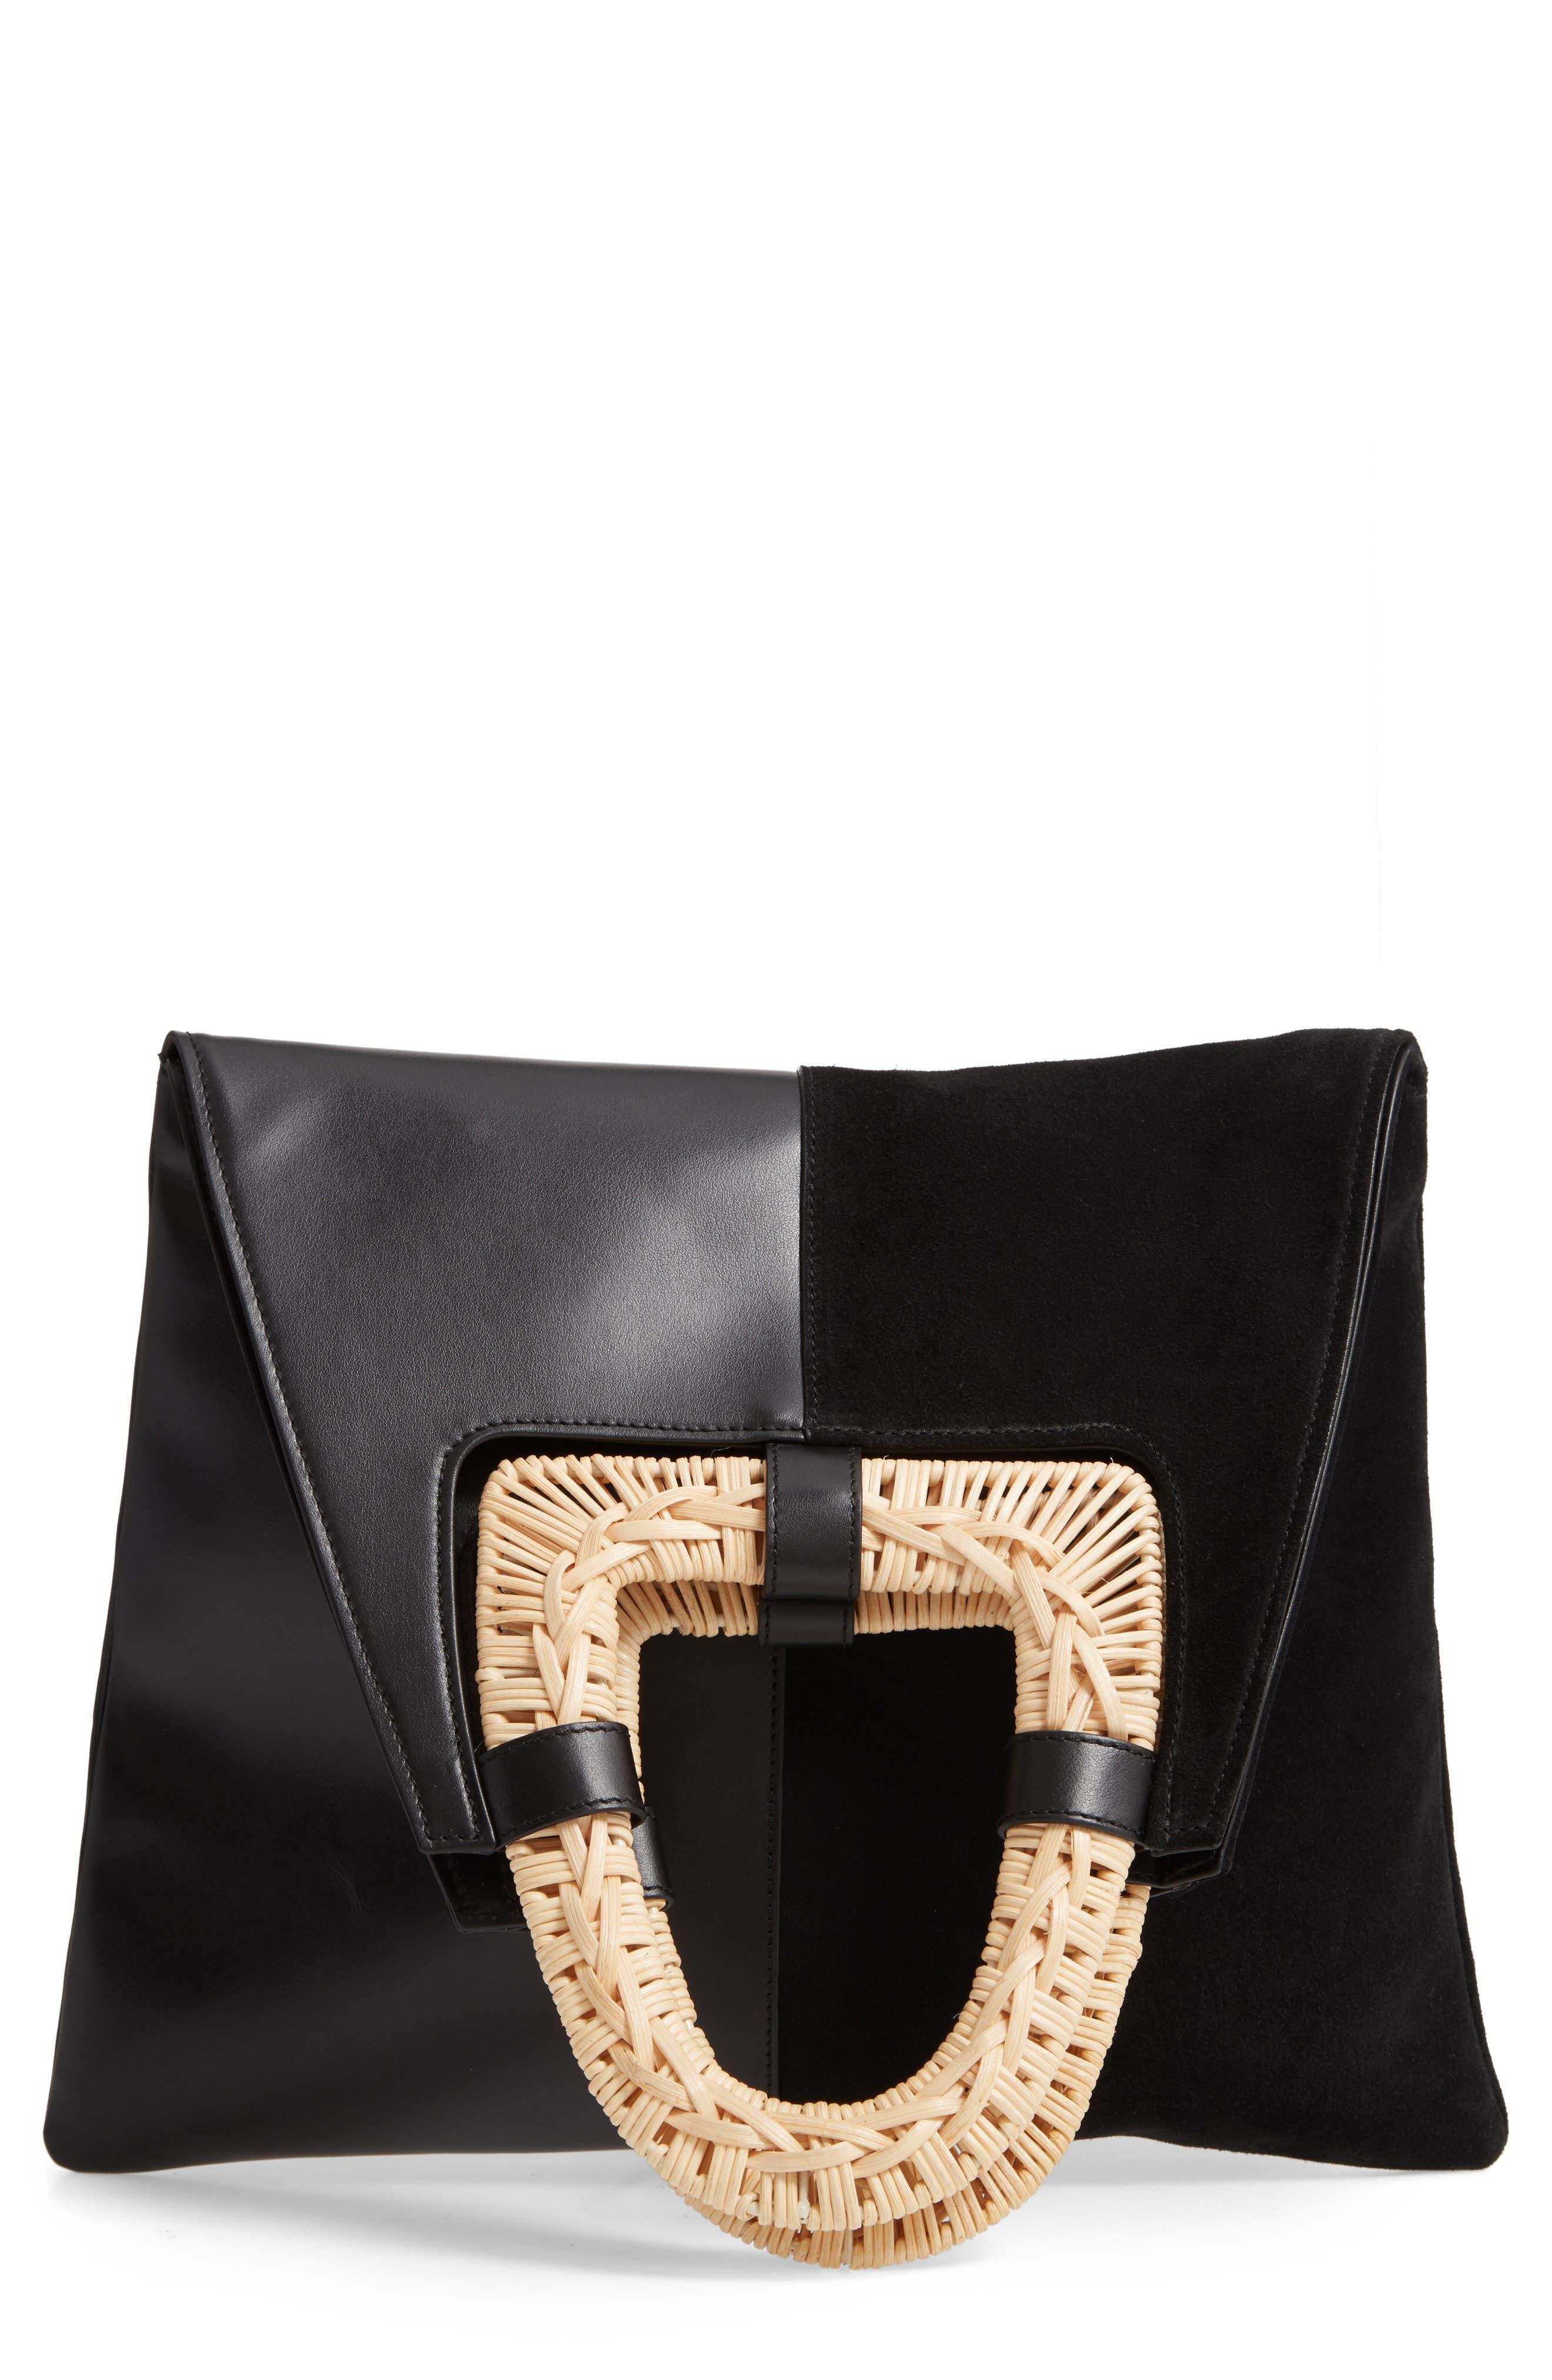 3ebf25b1ea Ulla Johnson Handbags & Purses | Nordstrom